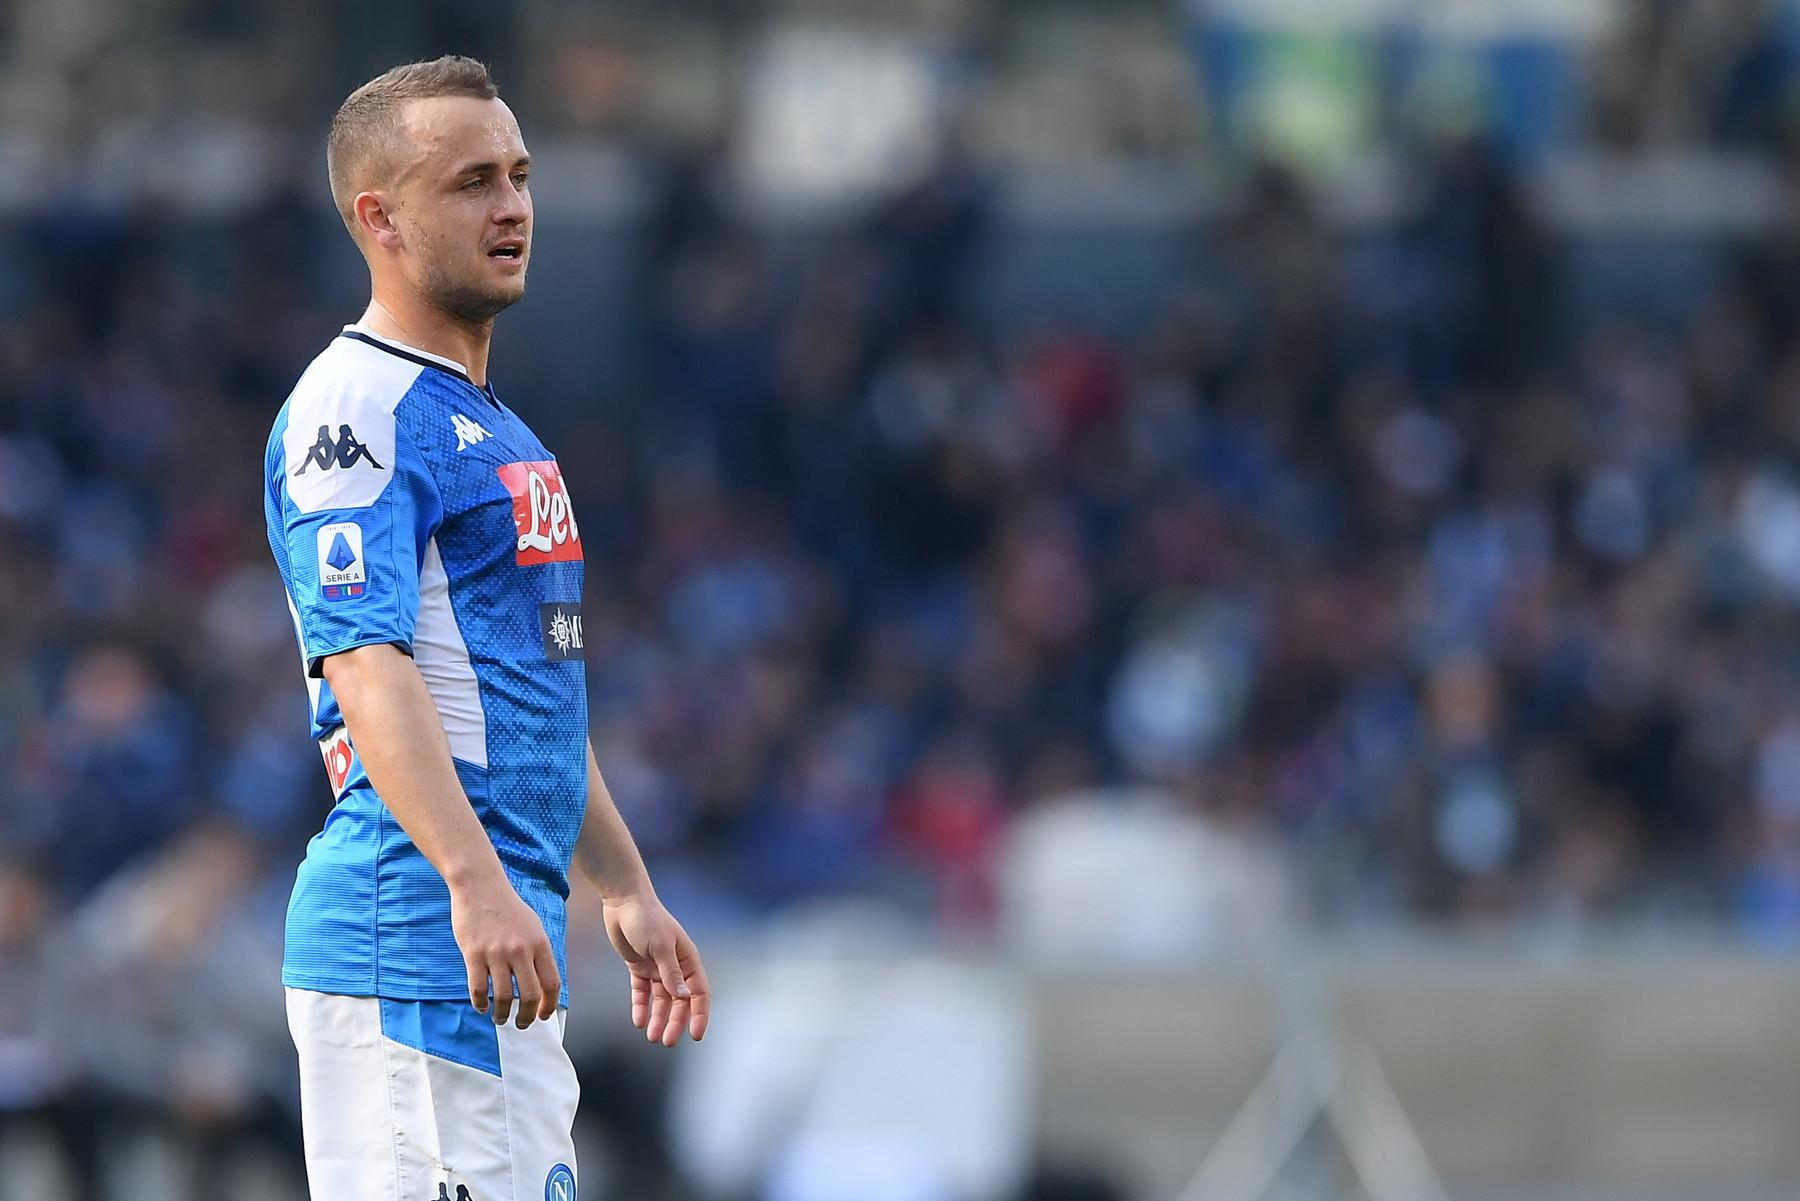 8 - STANISLAV LOBOTKA dal Celta Vigo al Napoli (20,9 milioni)